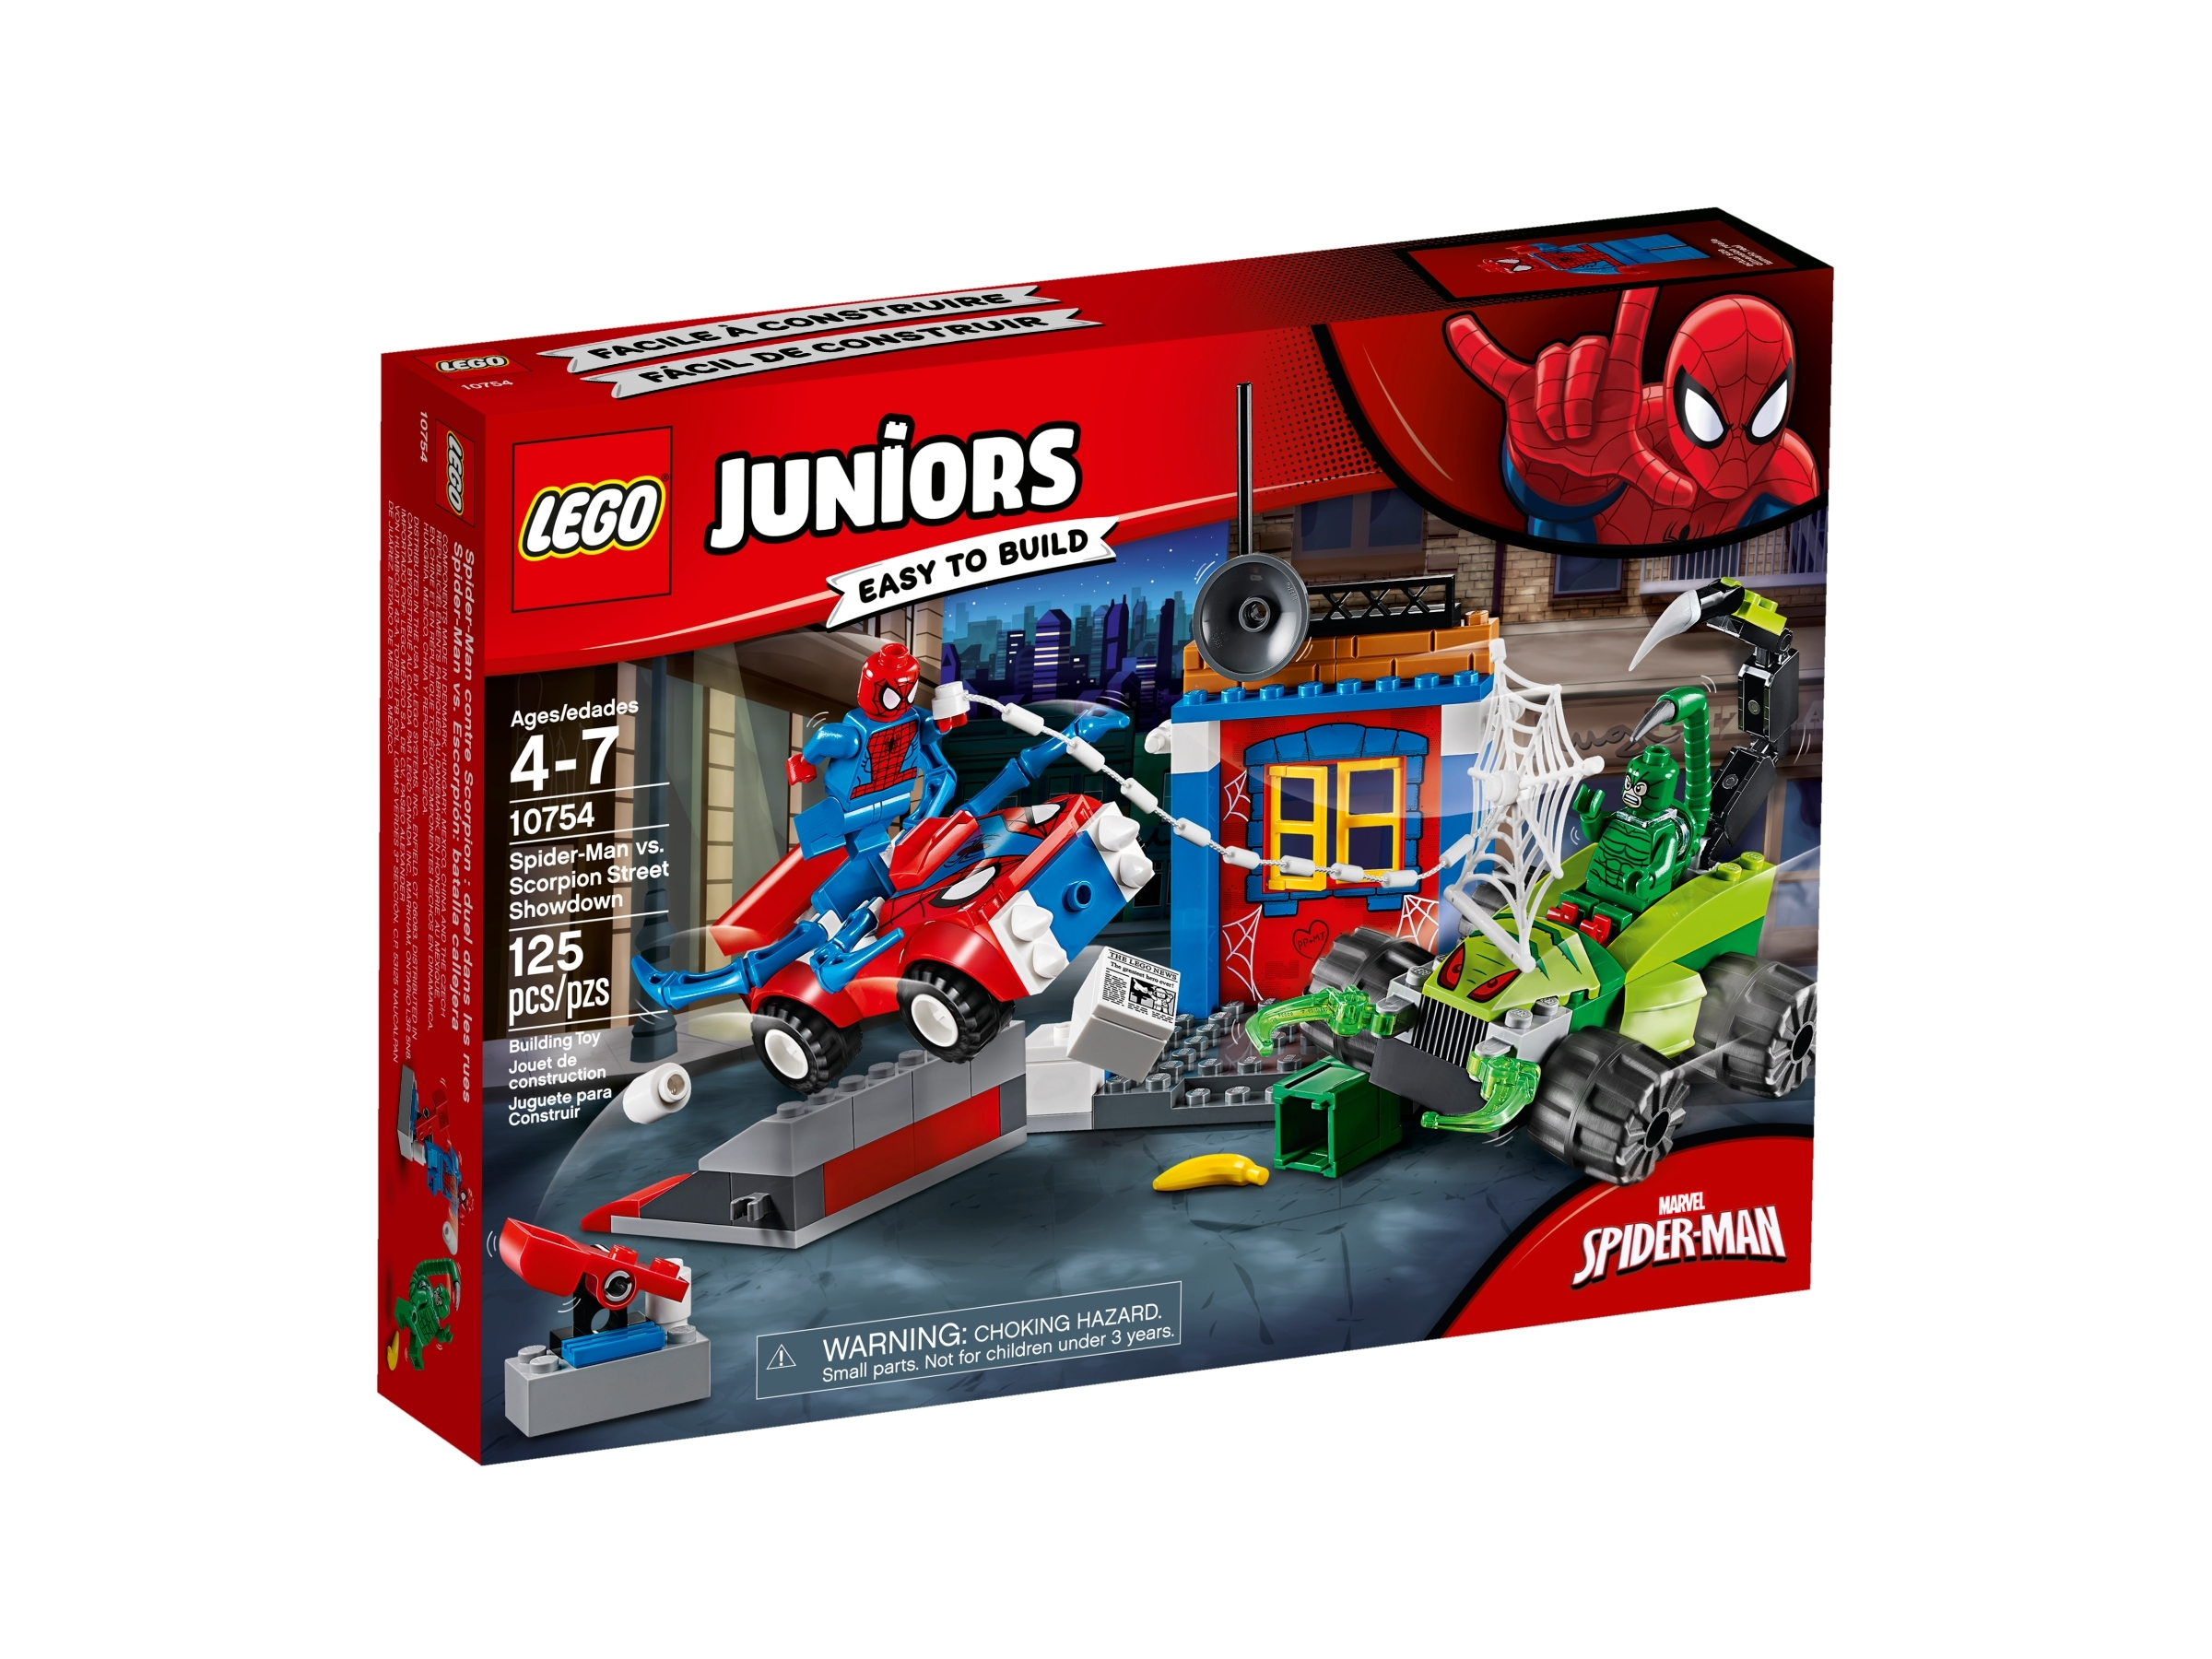 LEGO Juniors//4 Marvel Super Heroes Spider-Man vs Scorpion Street Showdown